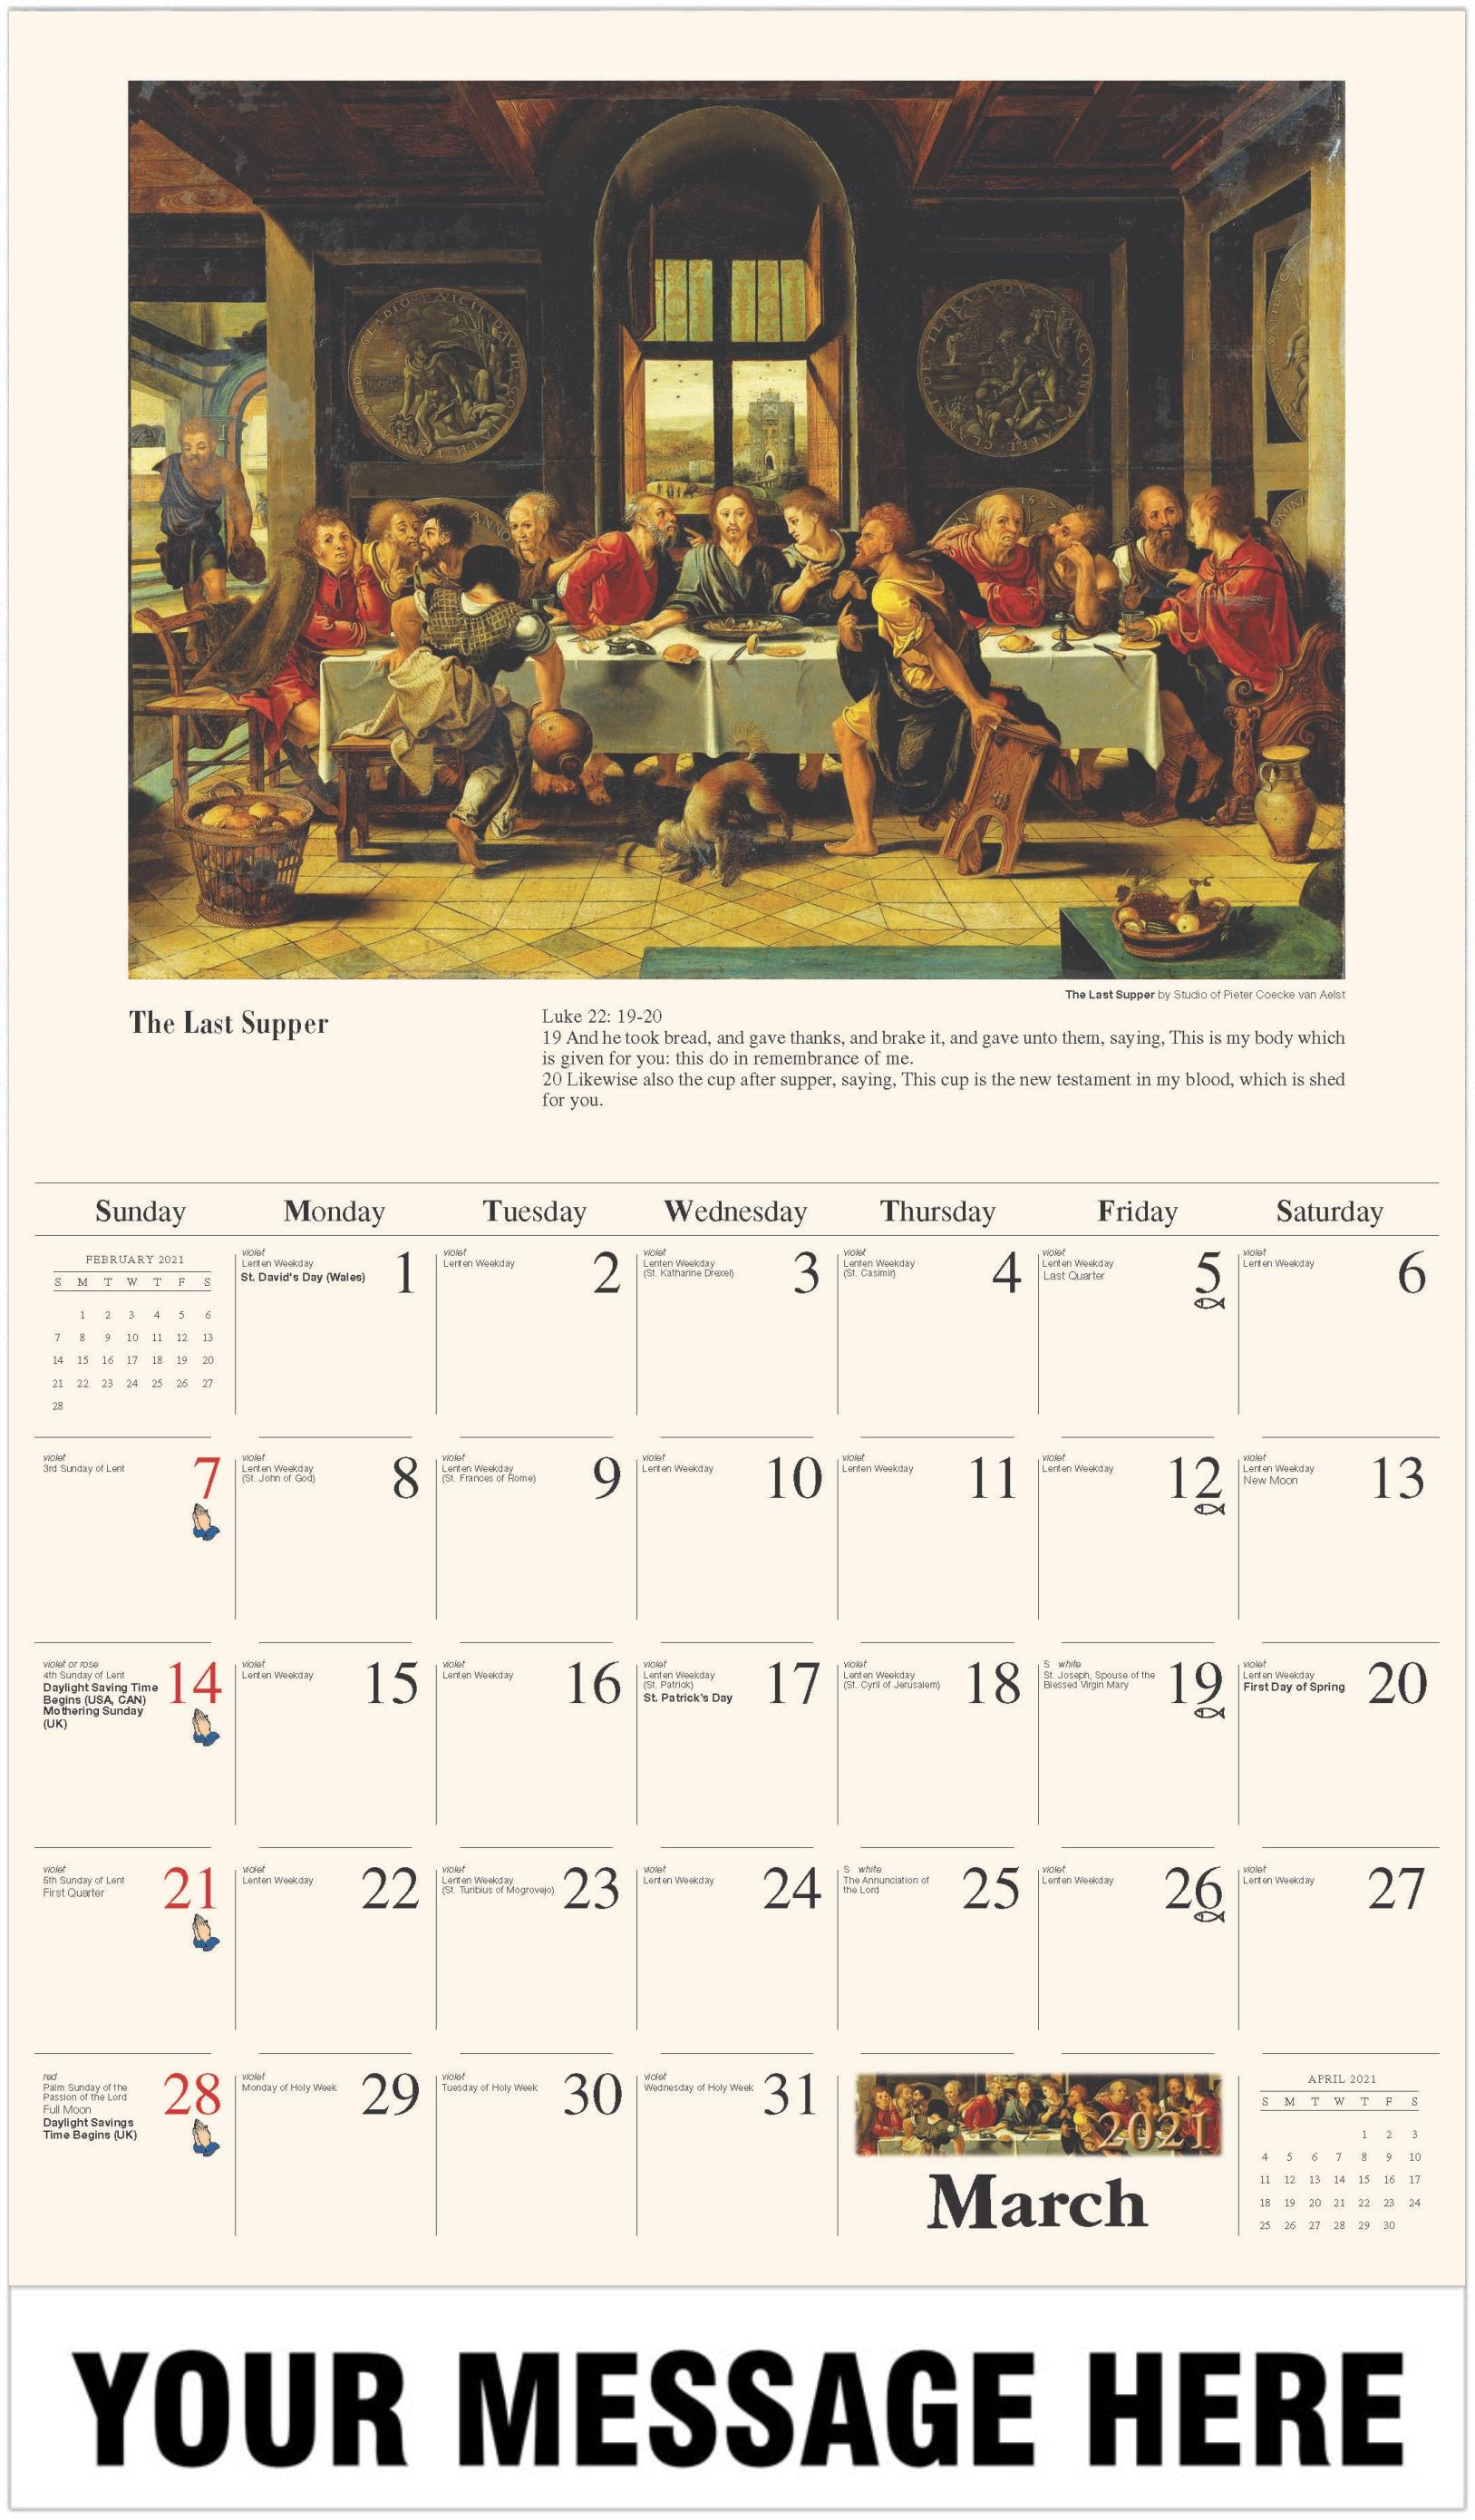 2021 Catholic Calendar Catholic Art 2021 Promotional Calendar   Fundraising and Business